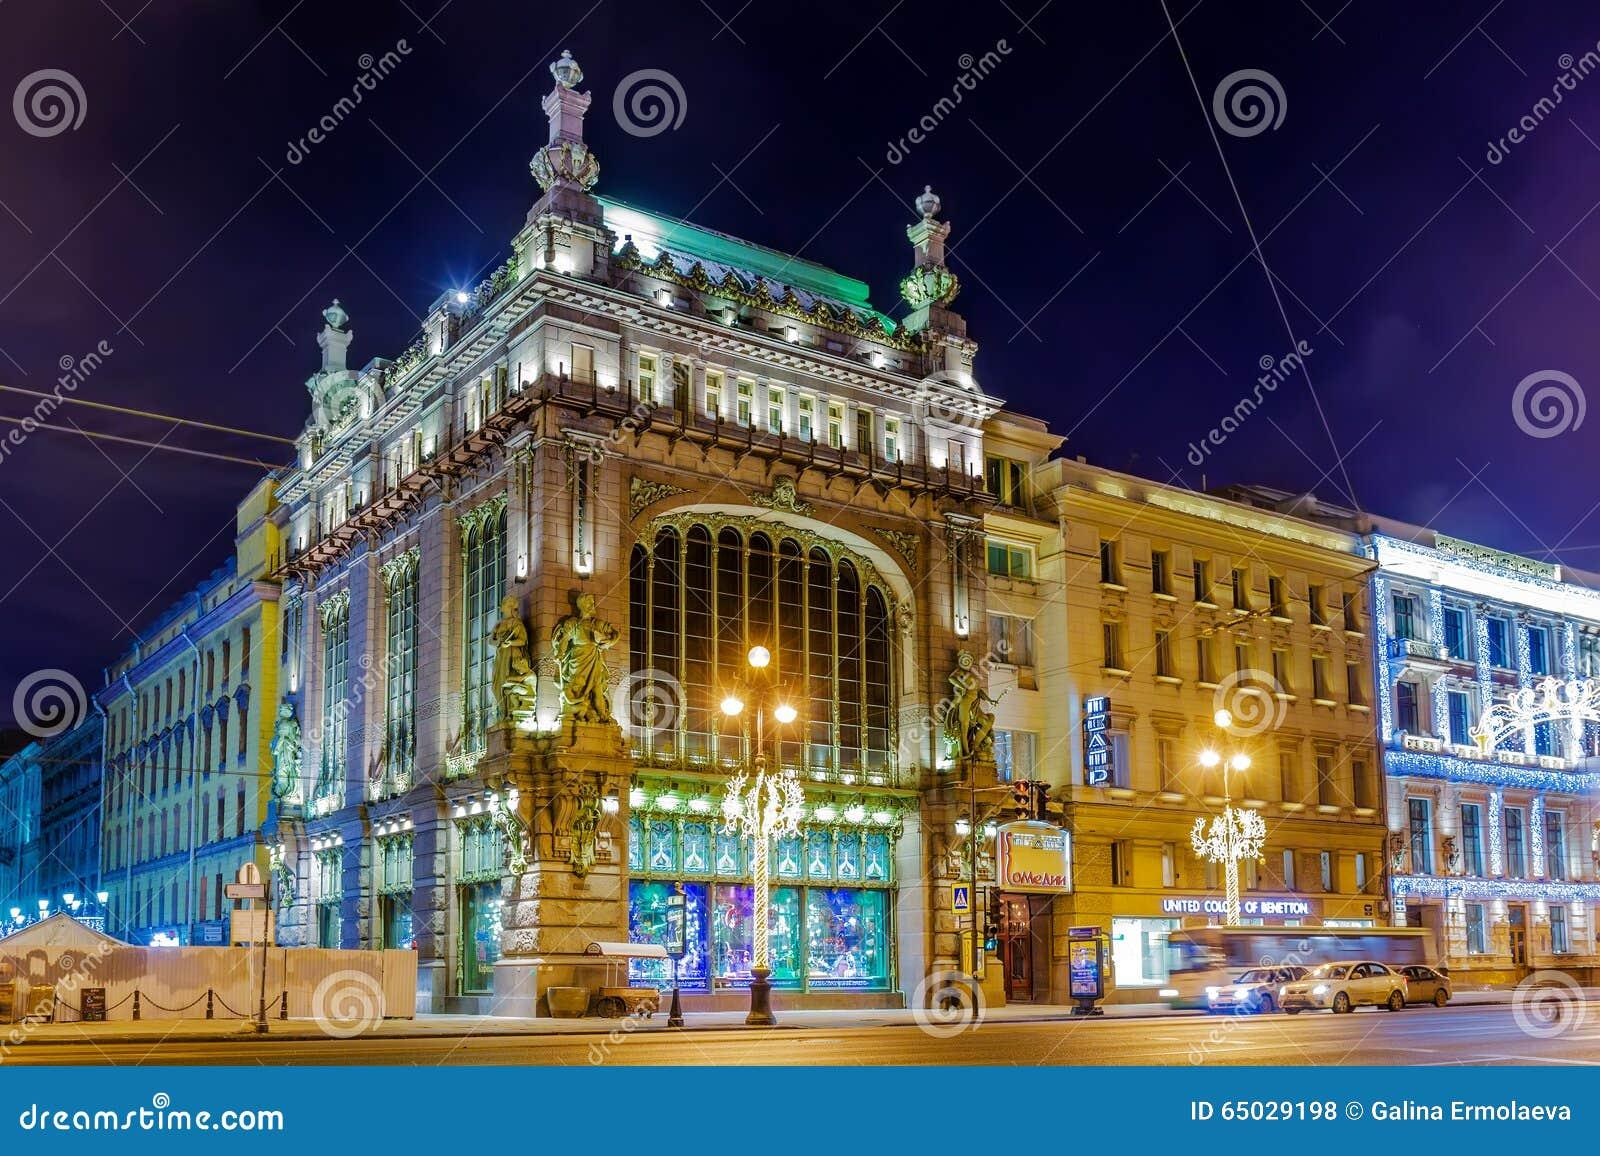 night view of buildings eliseevsky store on nevsky prospekt st petersburg editorial stock. Black Bedroom Furniture Sets. Home Design Ideas